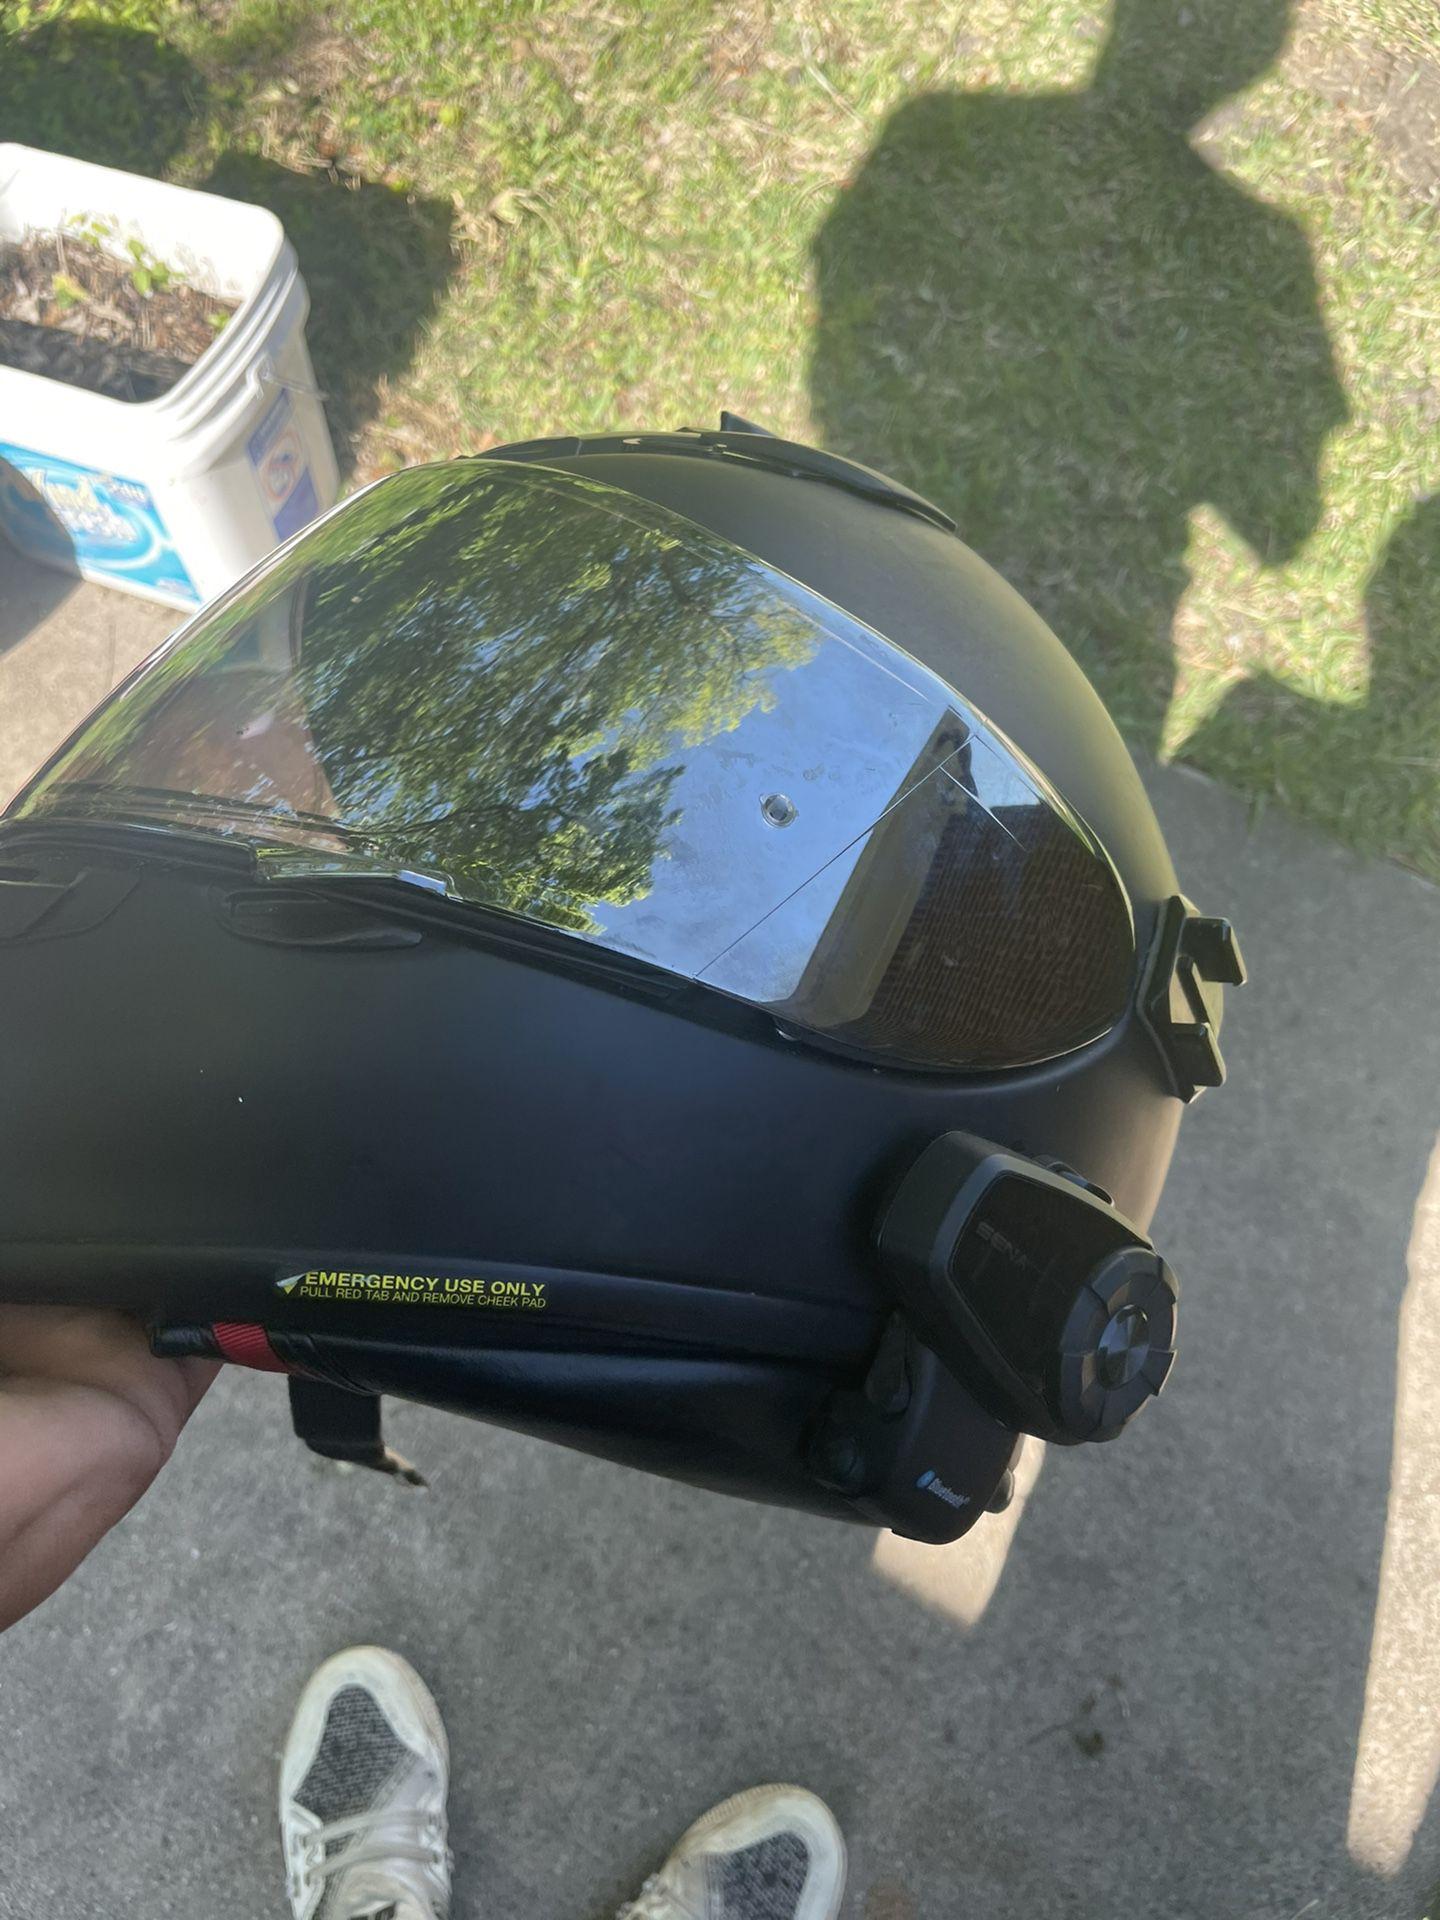 Photo Shoei Rf 1200 With Senna Bluetooth Price Is Firm !